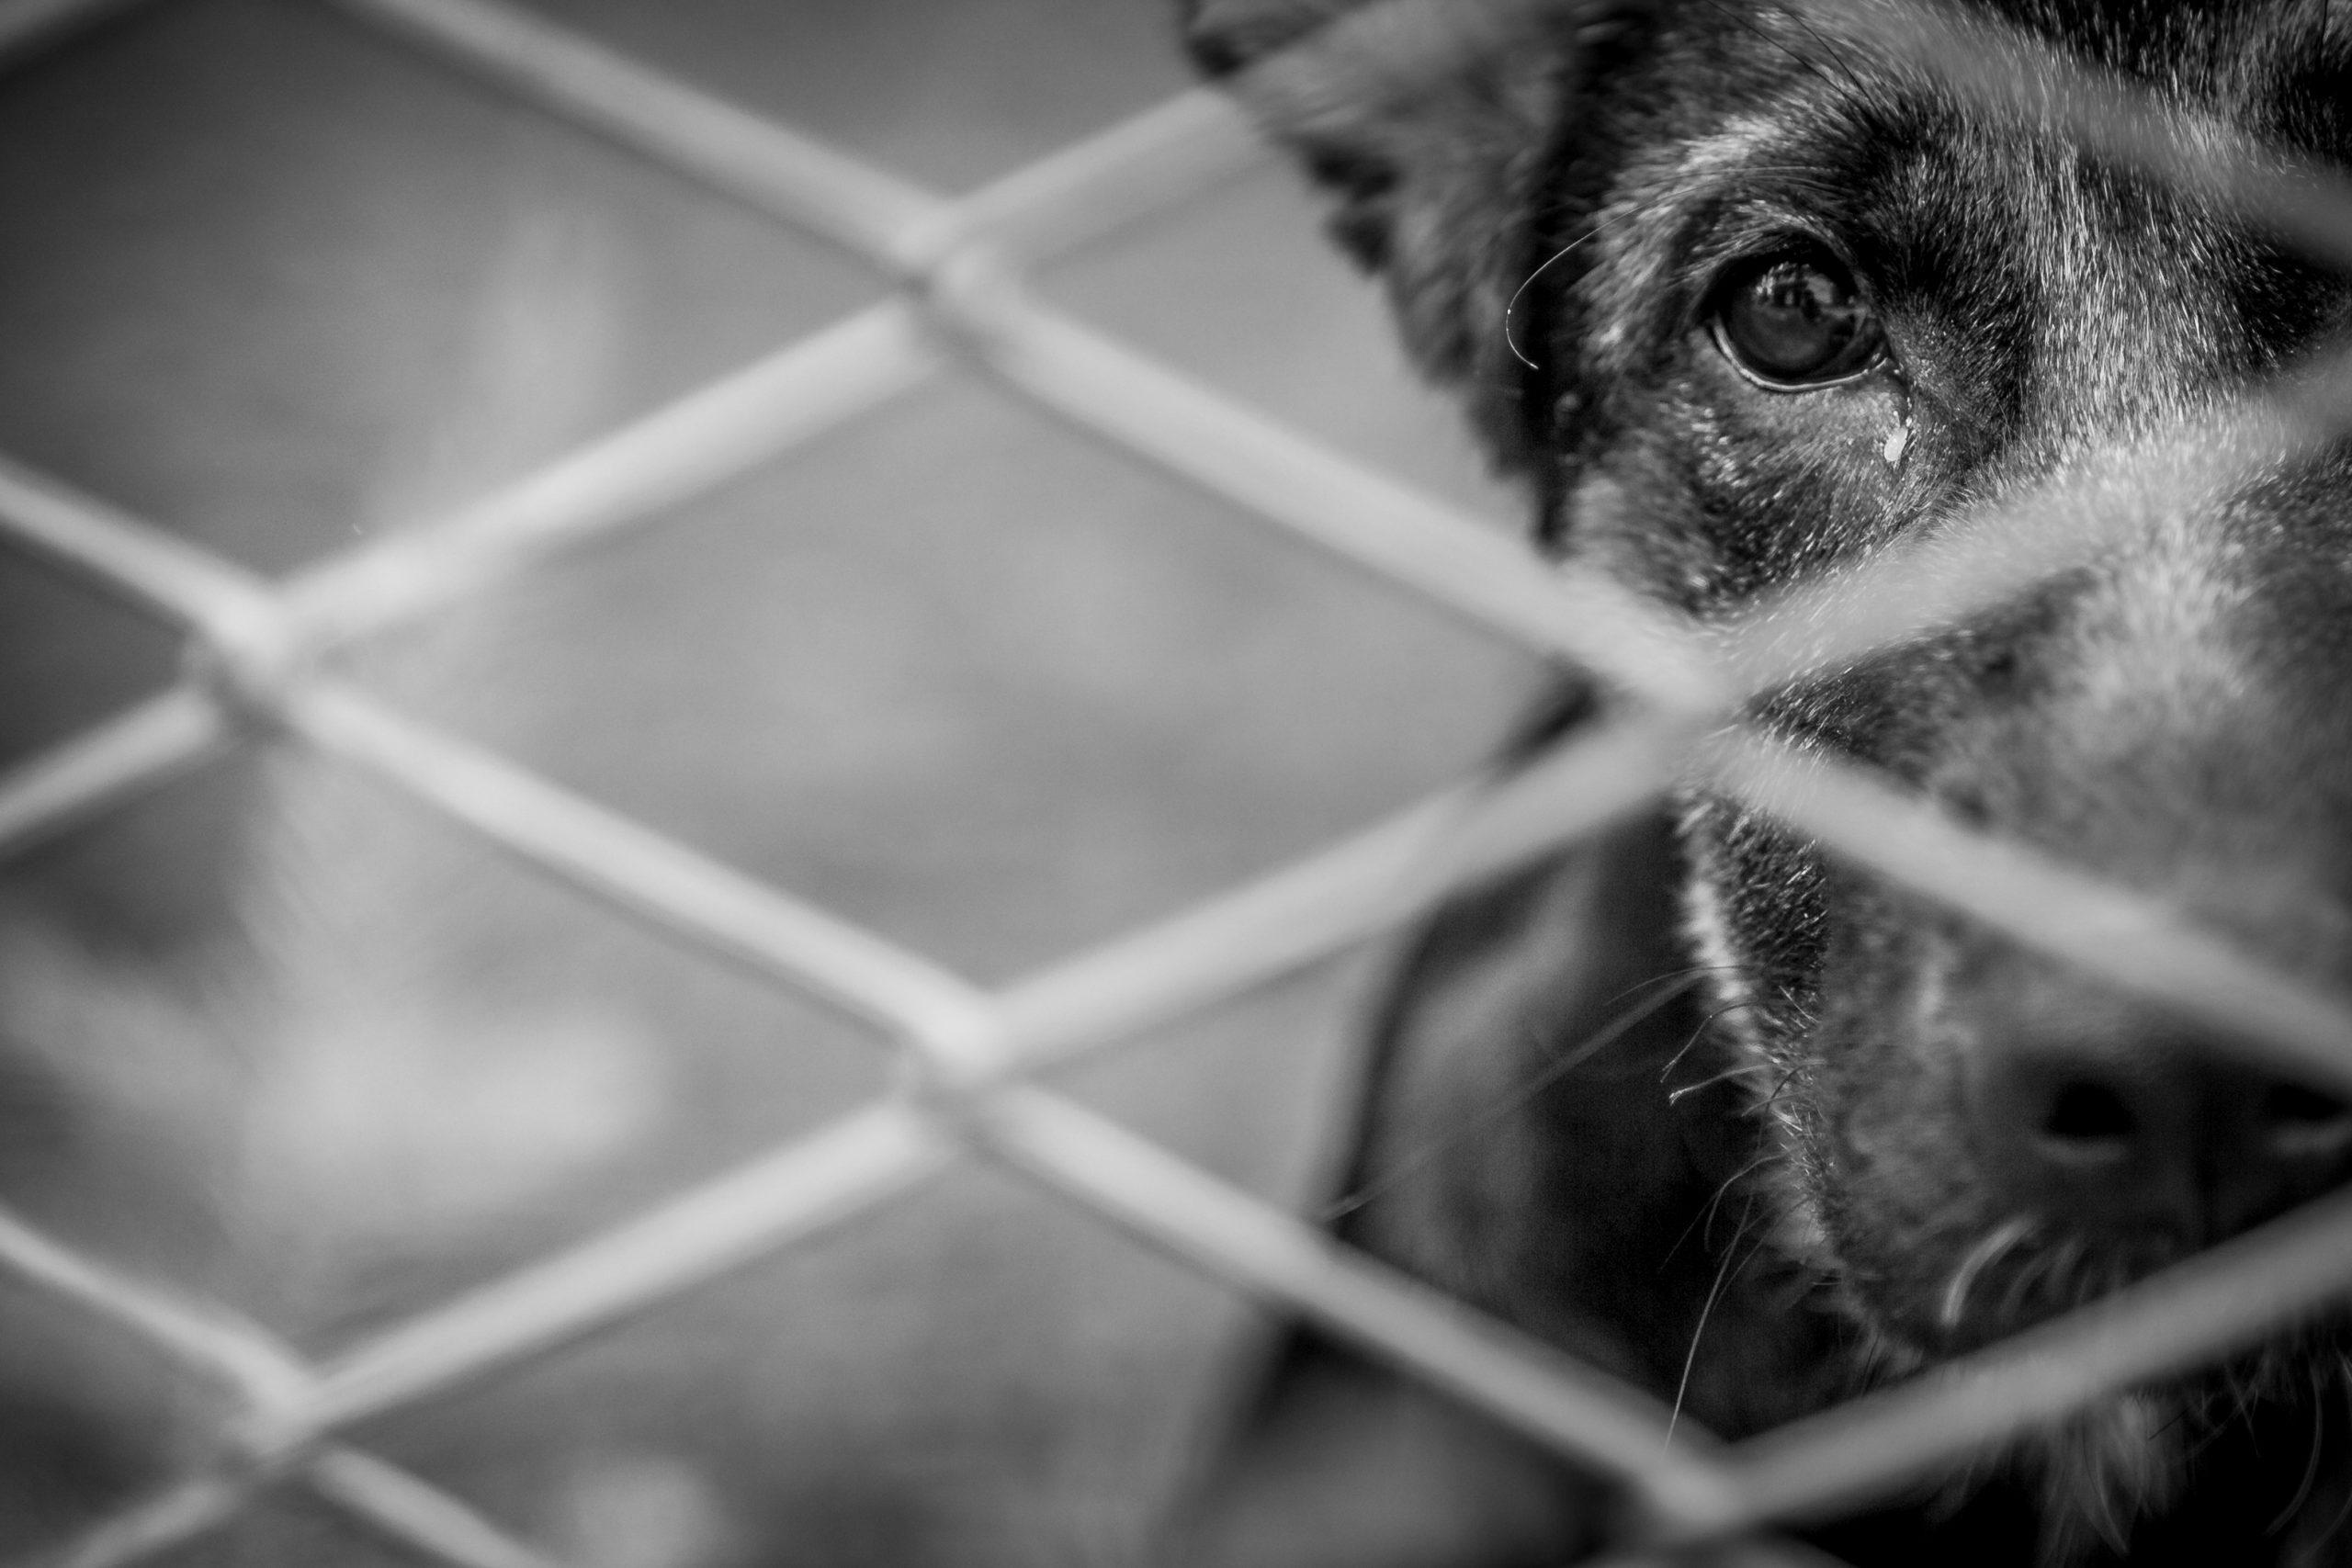 Signaler vidéos et photos cruauté animal